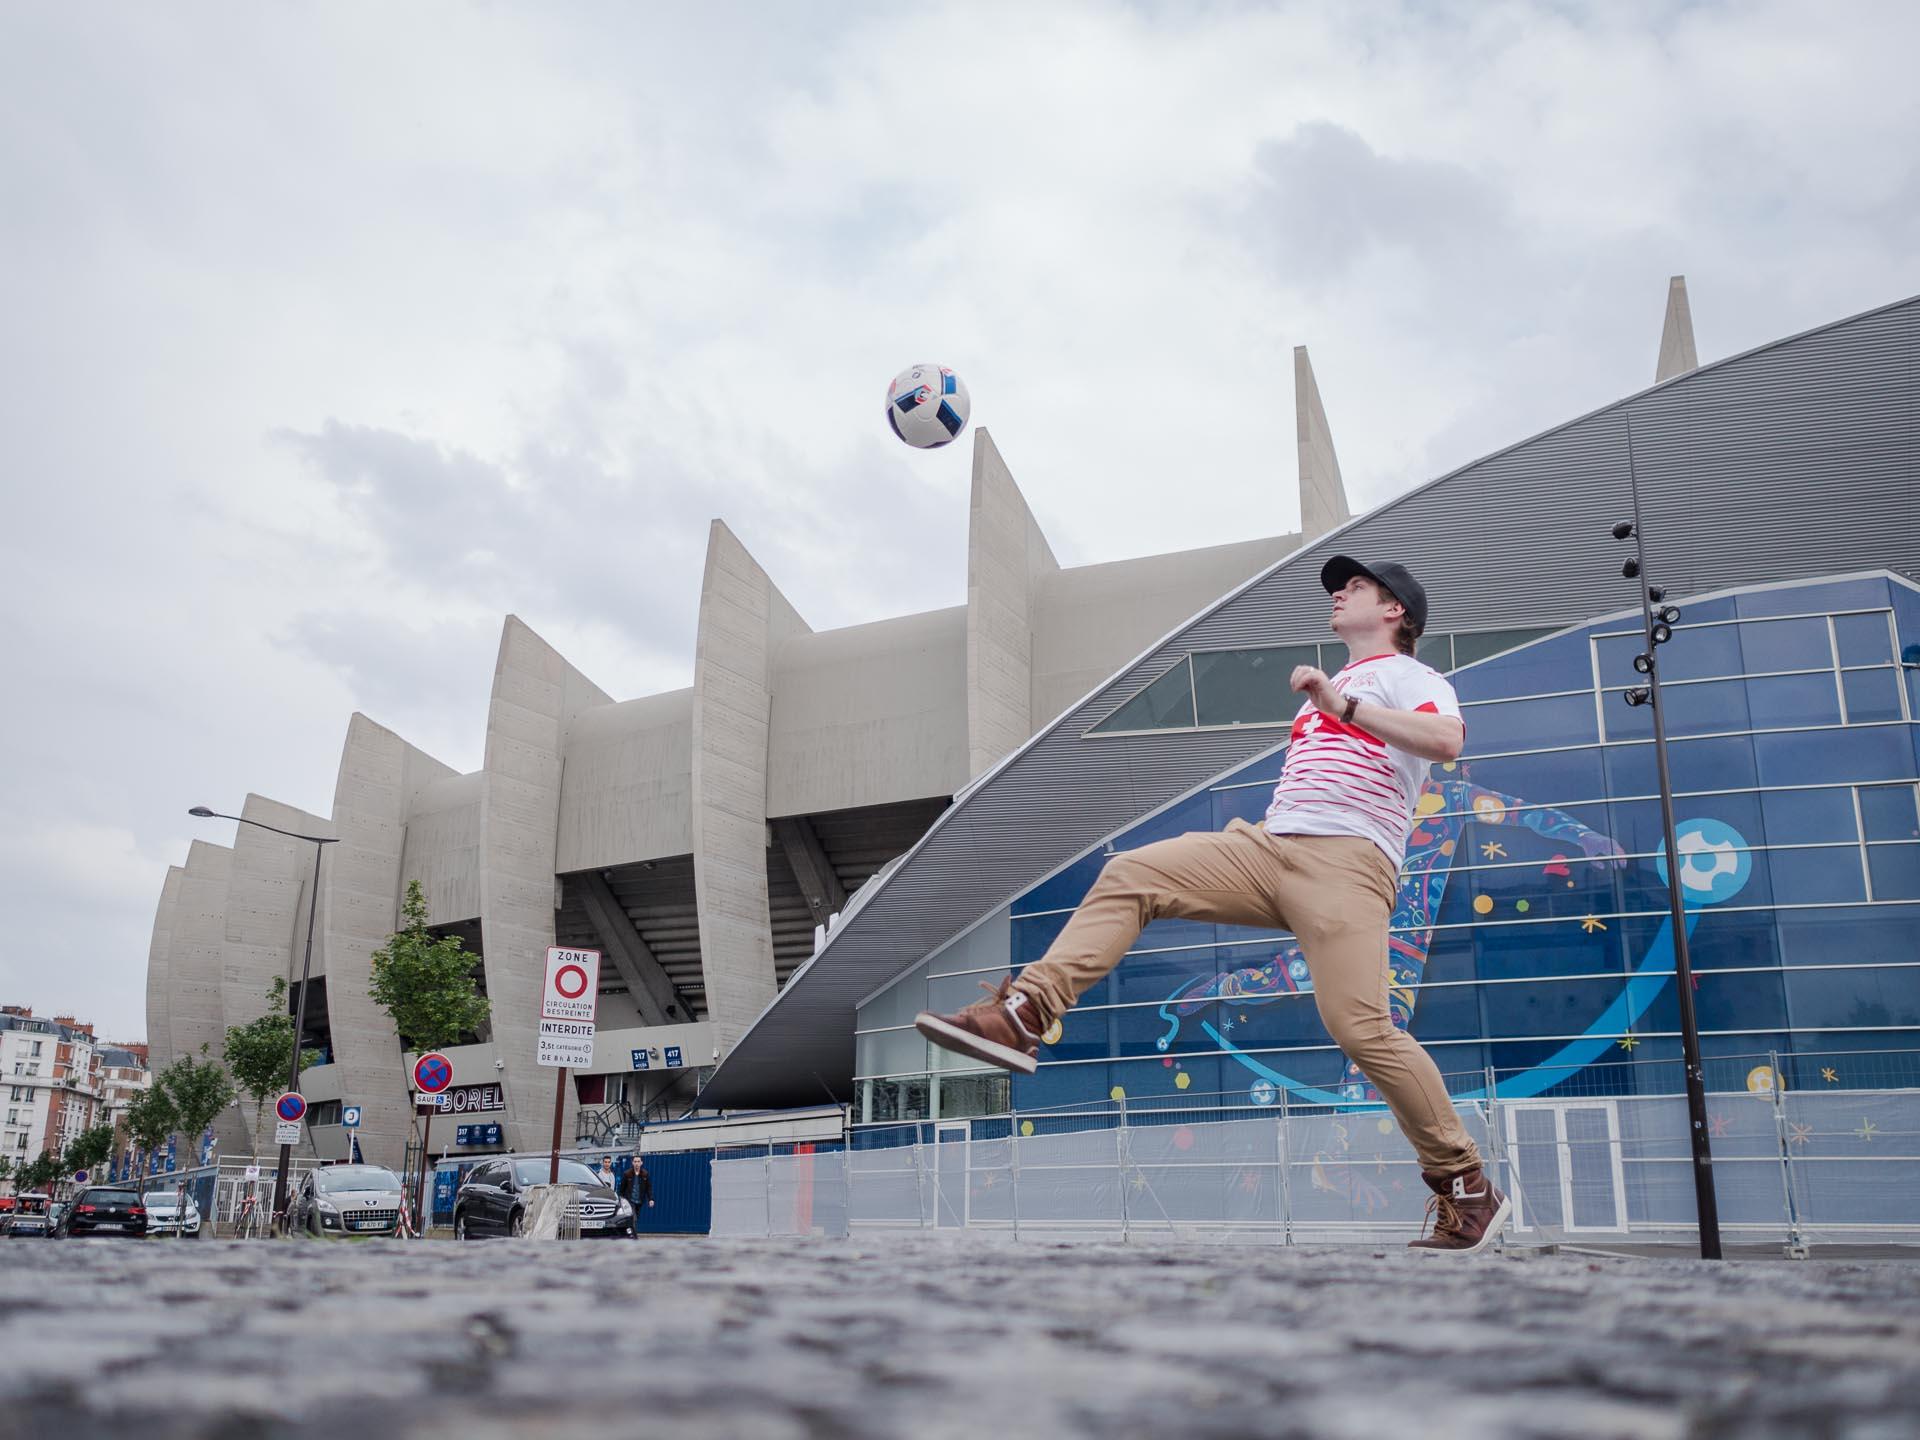 Paris Port de Princes UEFA EURO 2016 Adi-1